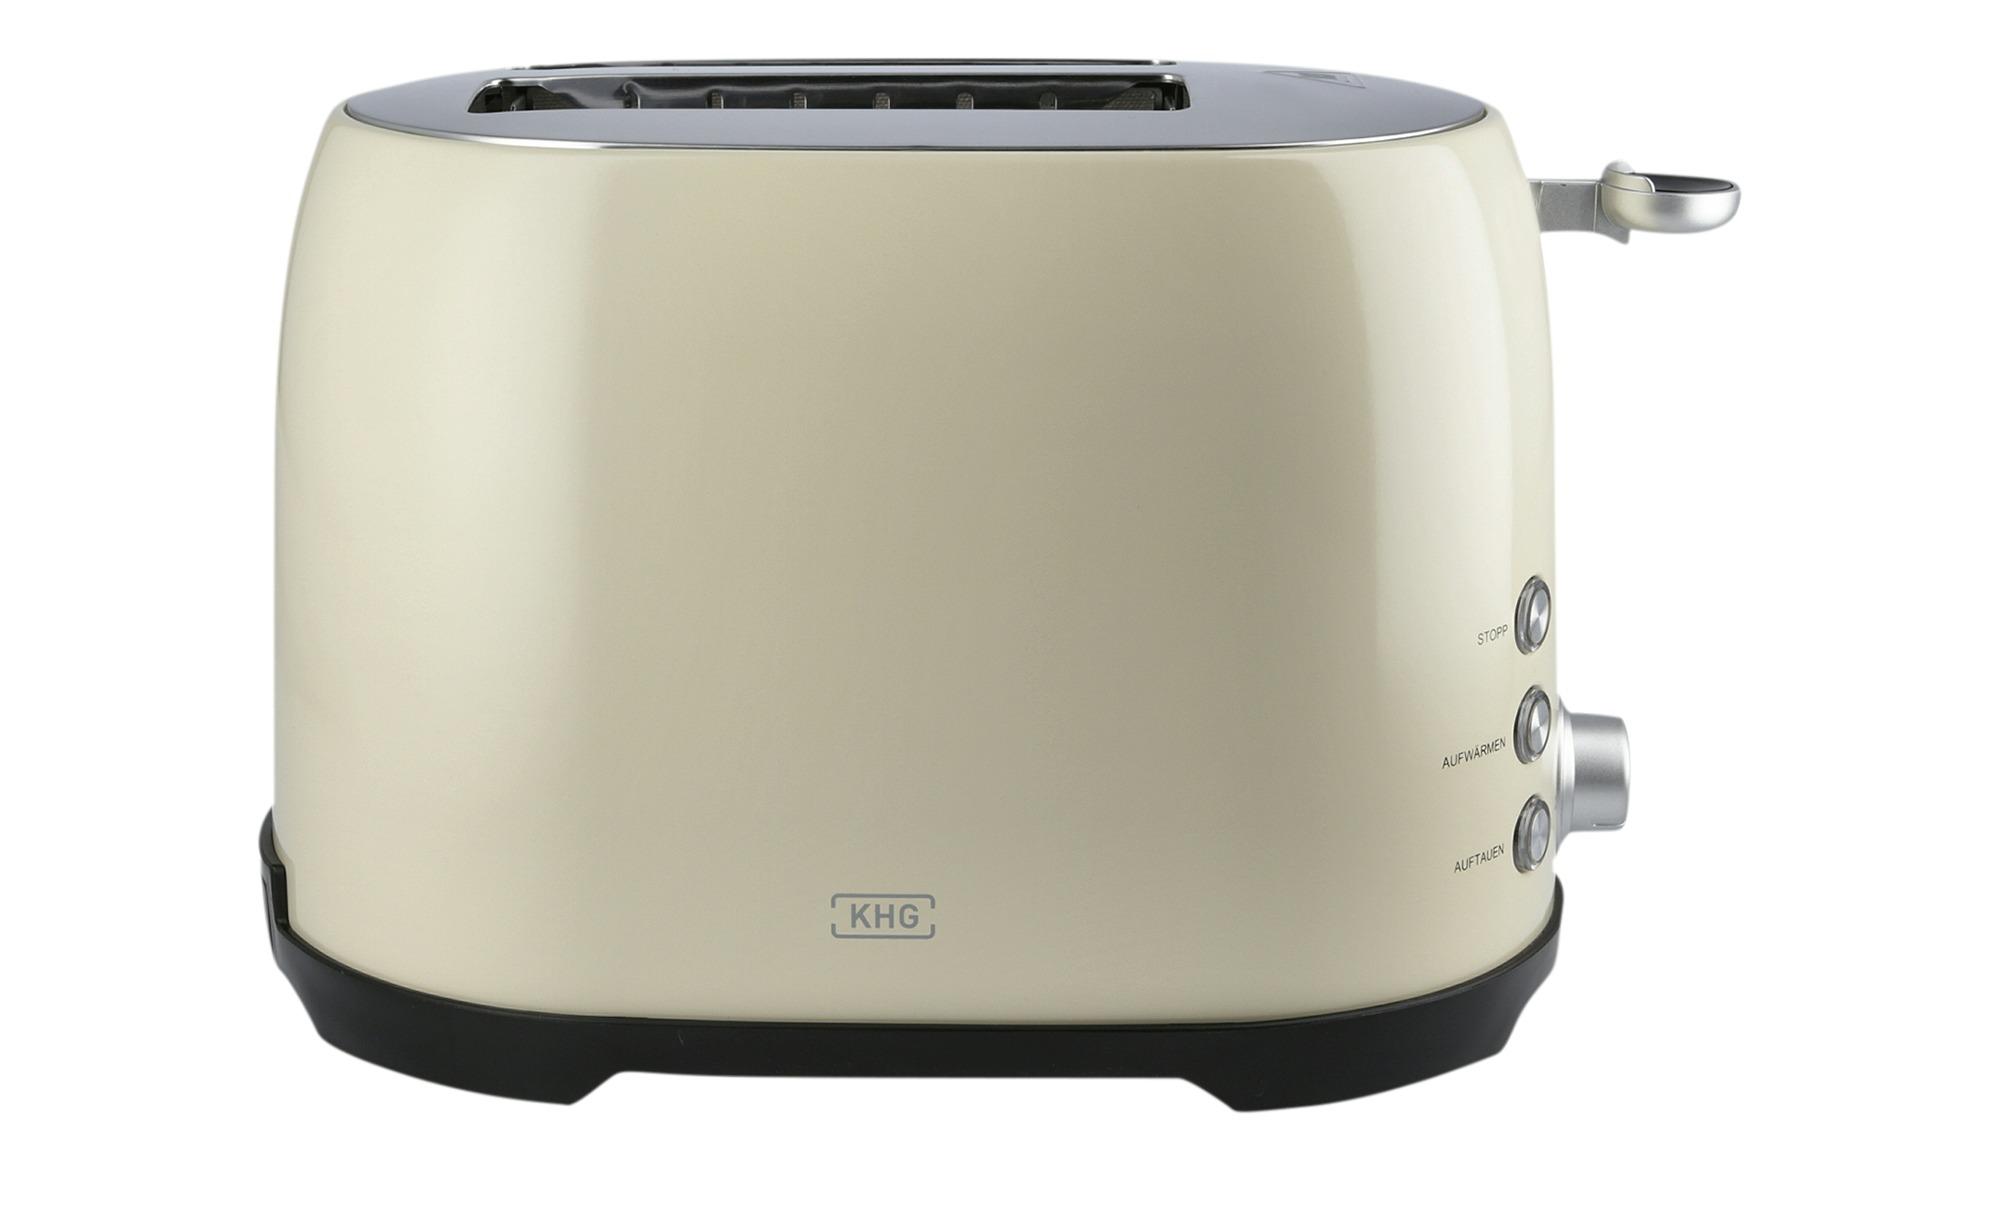 KHG Toaster  TO-858 CE - creme - Edelstahl, Kunststoff - 31 cm - 20 cm - 18 cm - Elektrokleingeräte > Toaster - Möbel Kraft   Küche und Esszimmer > Küchengeräte > Toaster   KHG